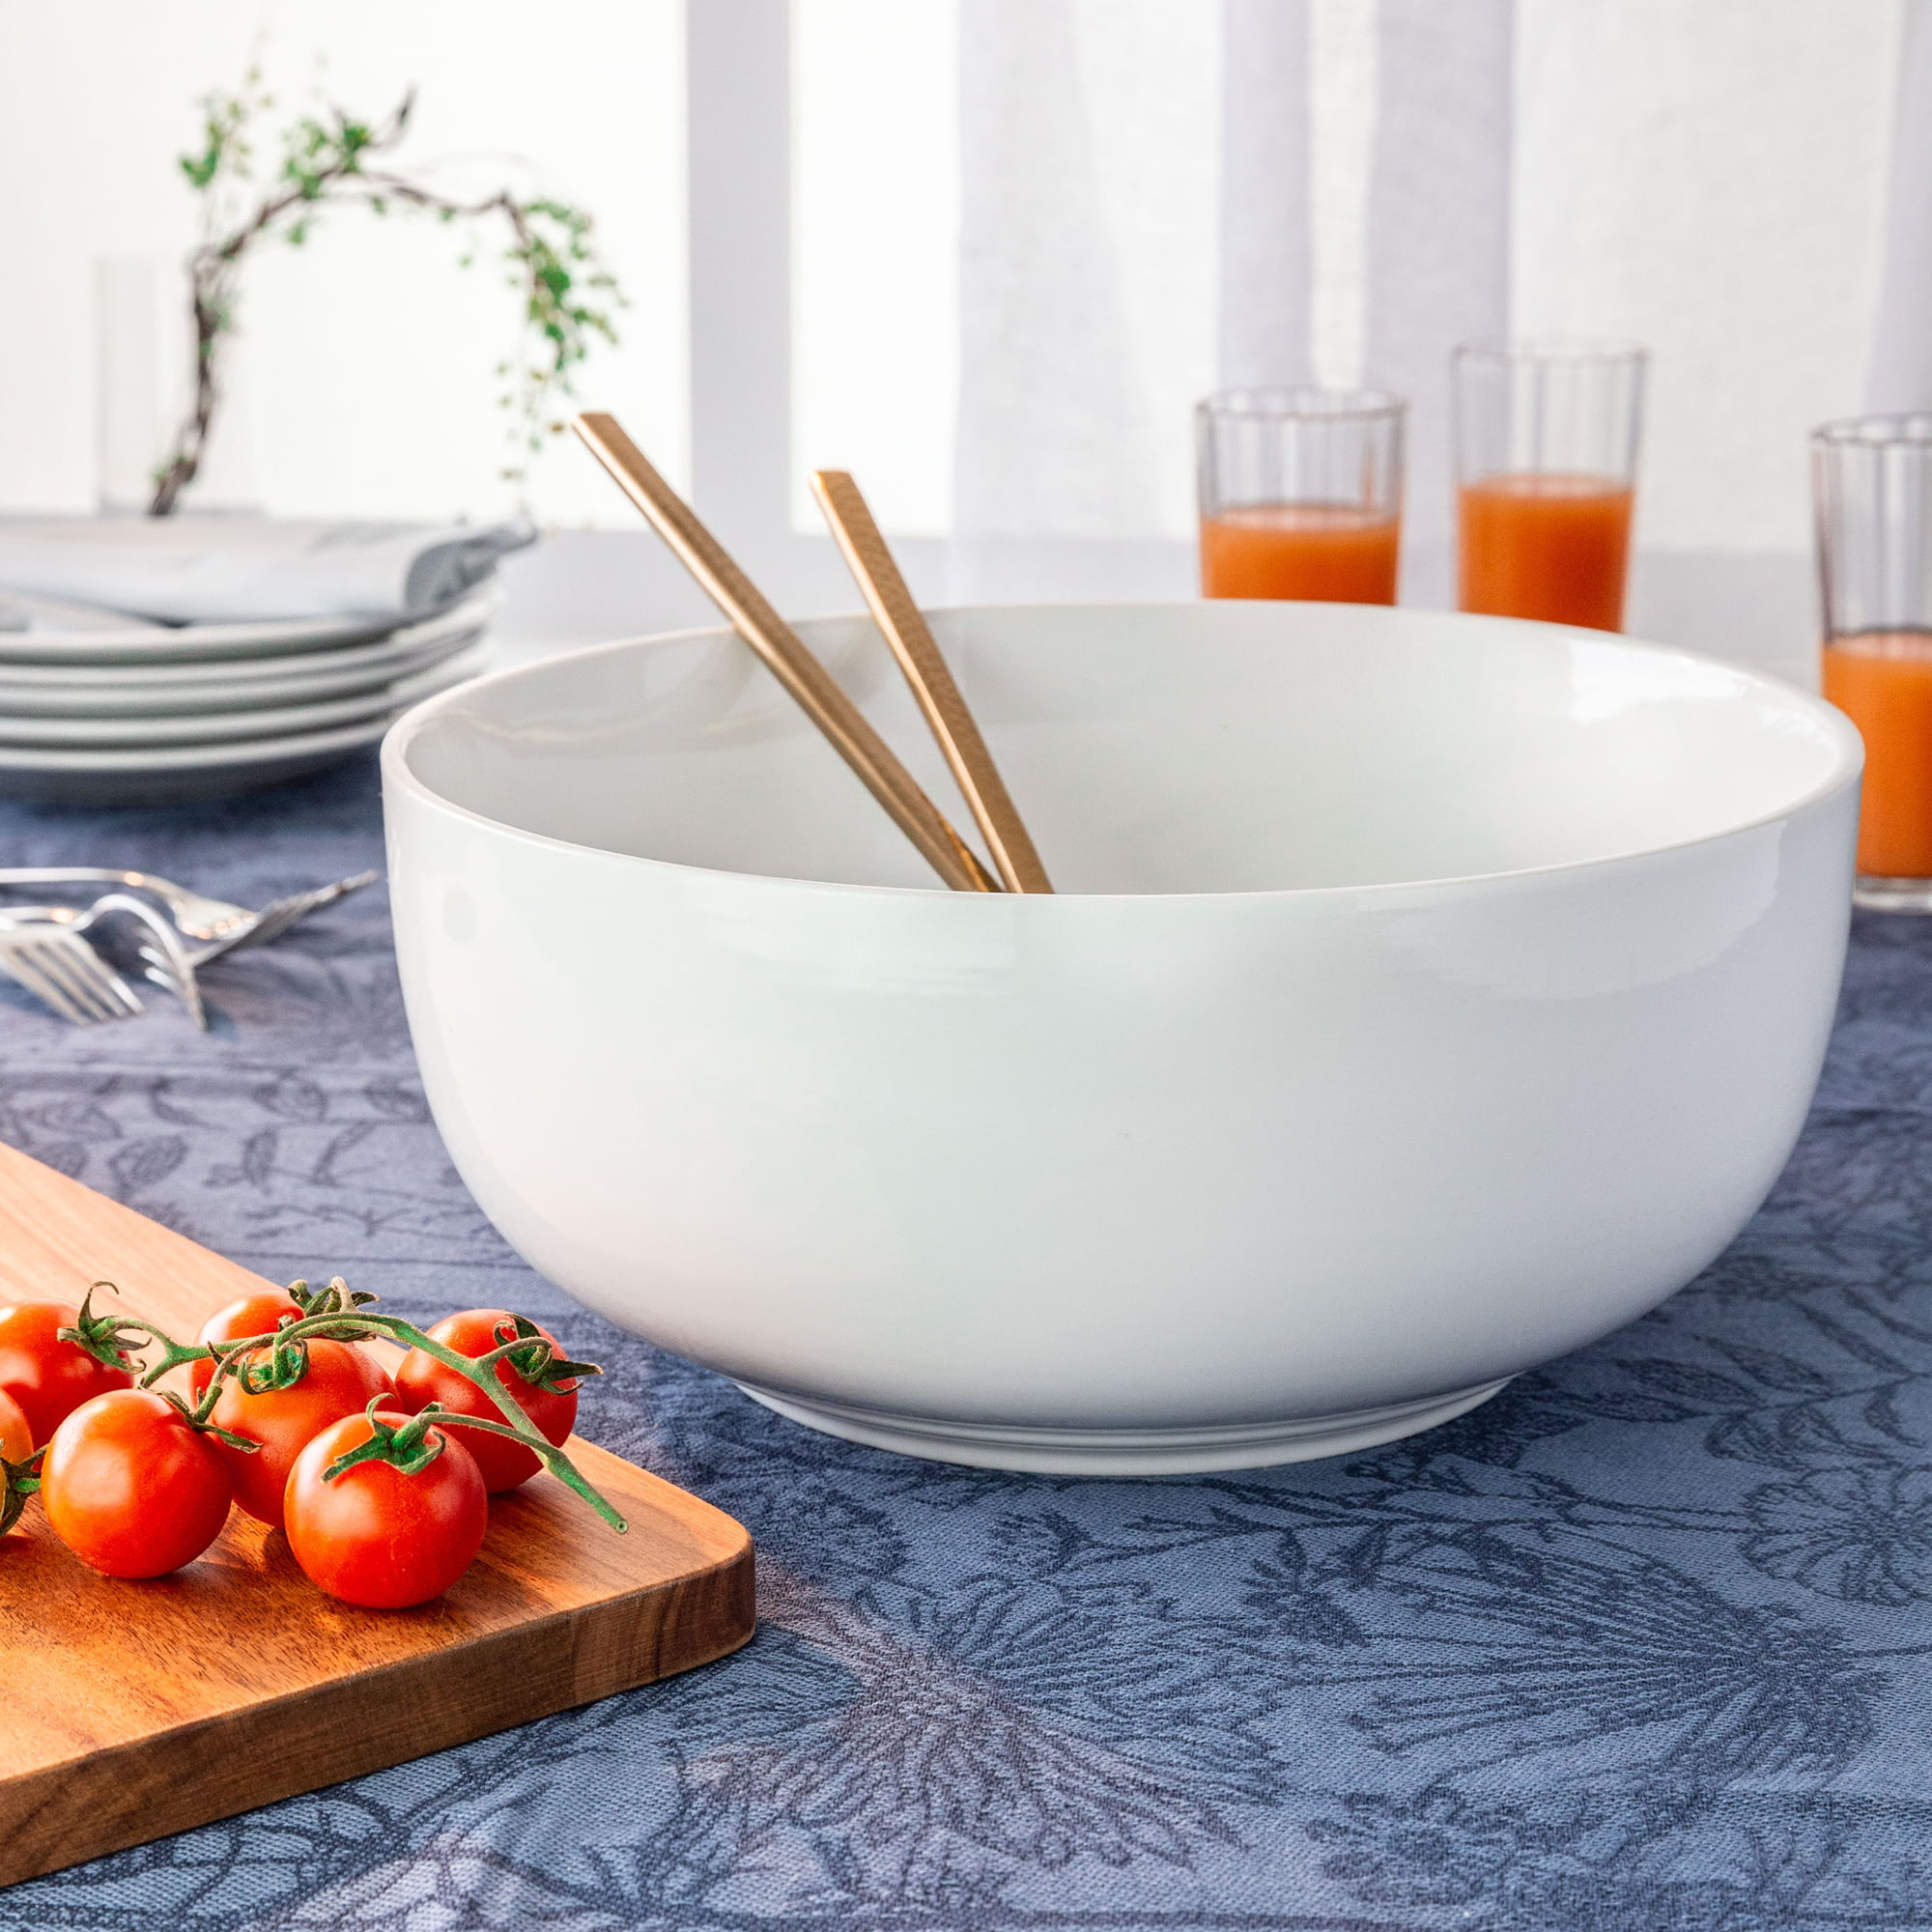 Better Homes & Gardens Round Bowl, White Porcelain - Walmart.com